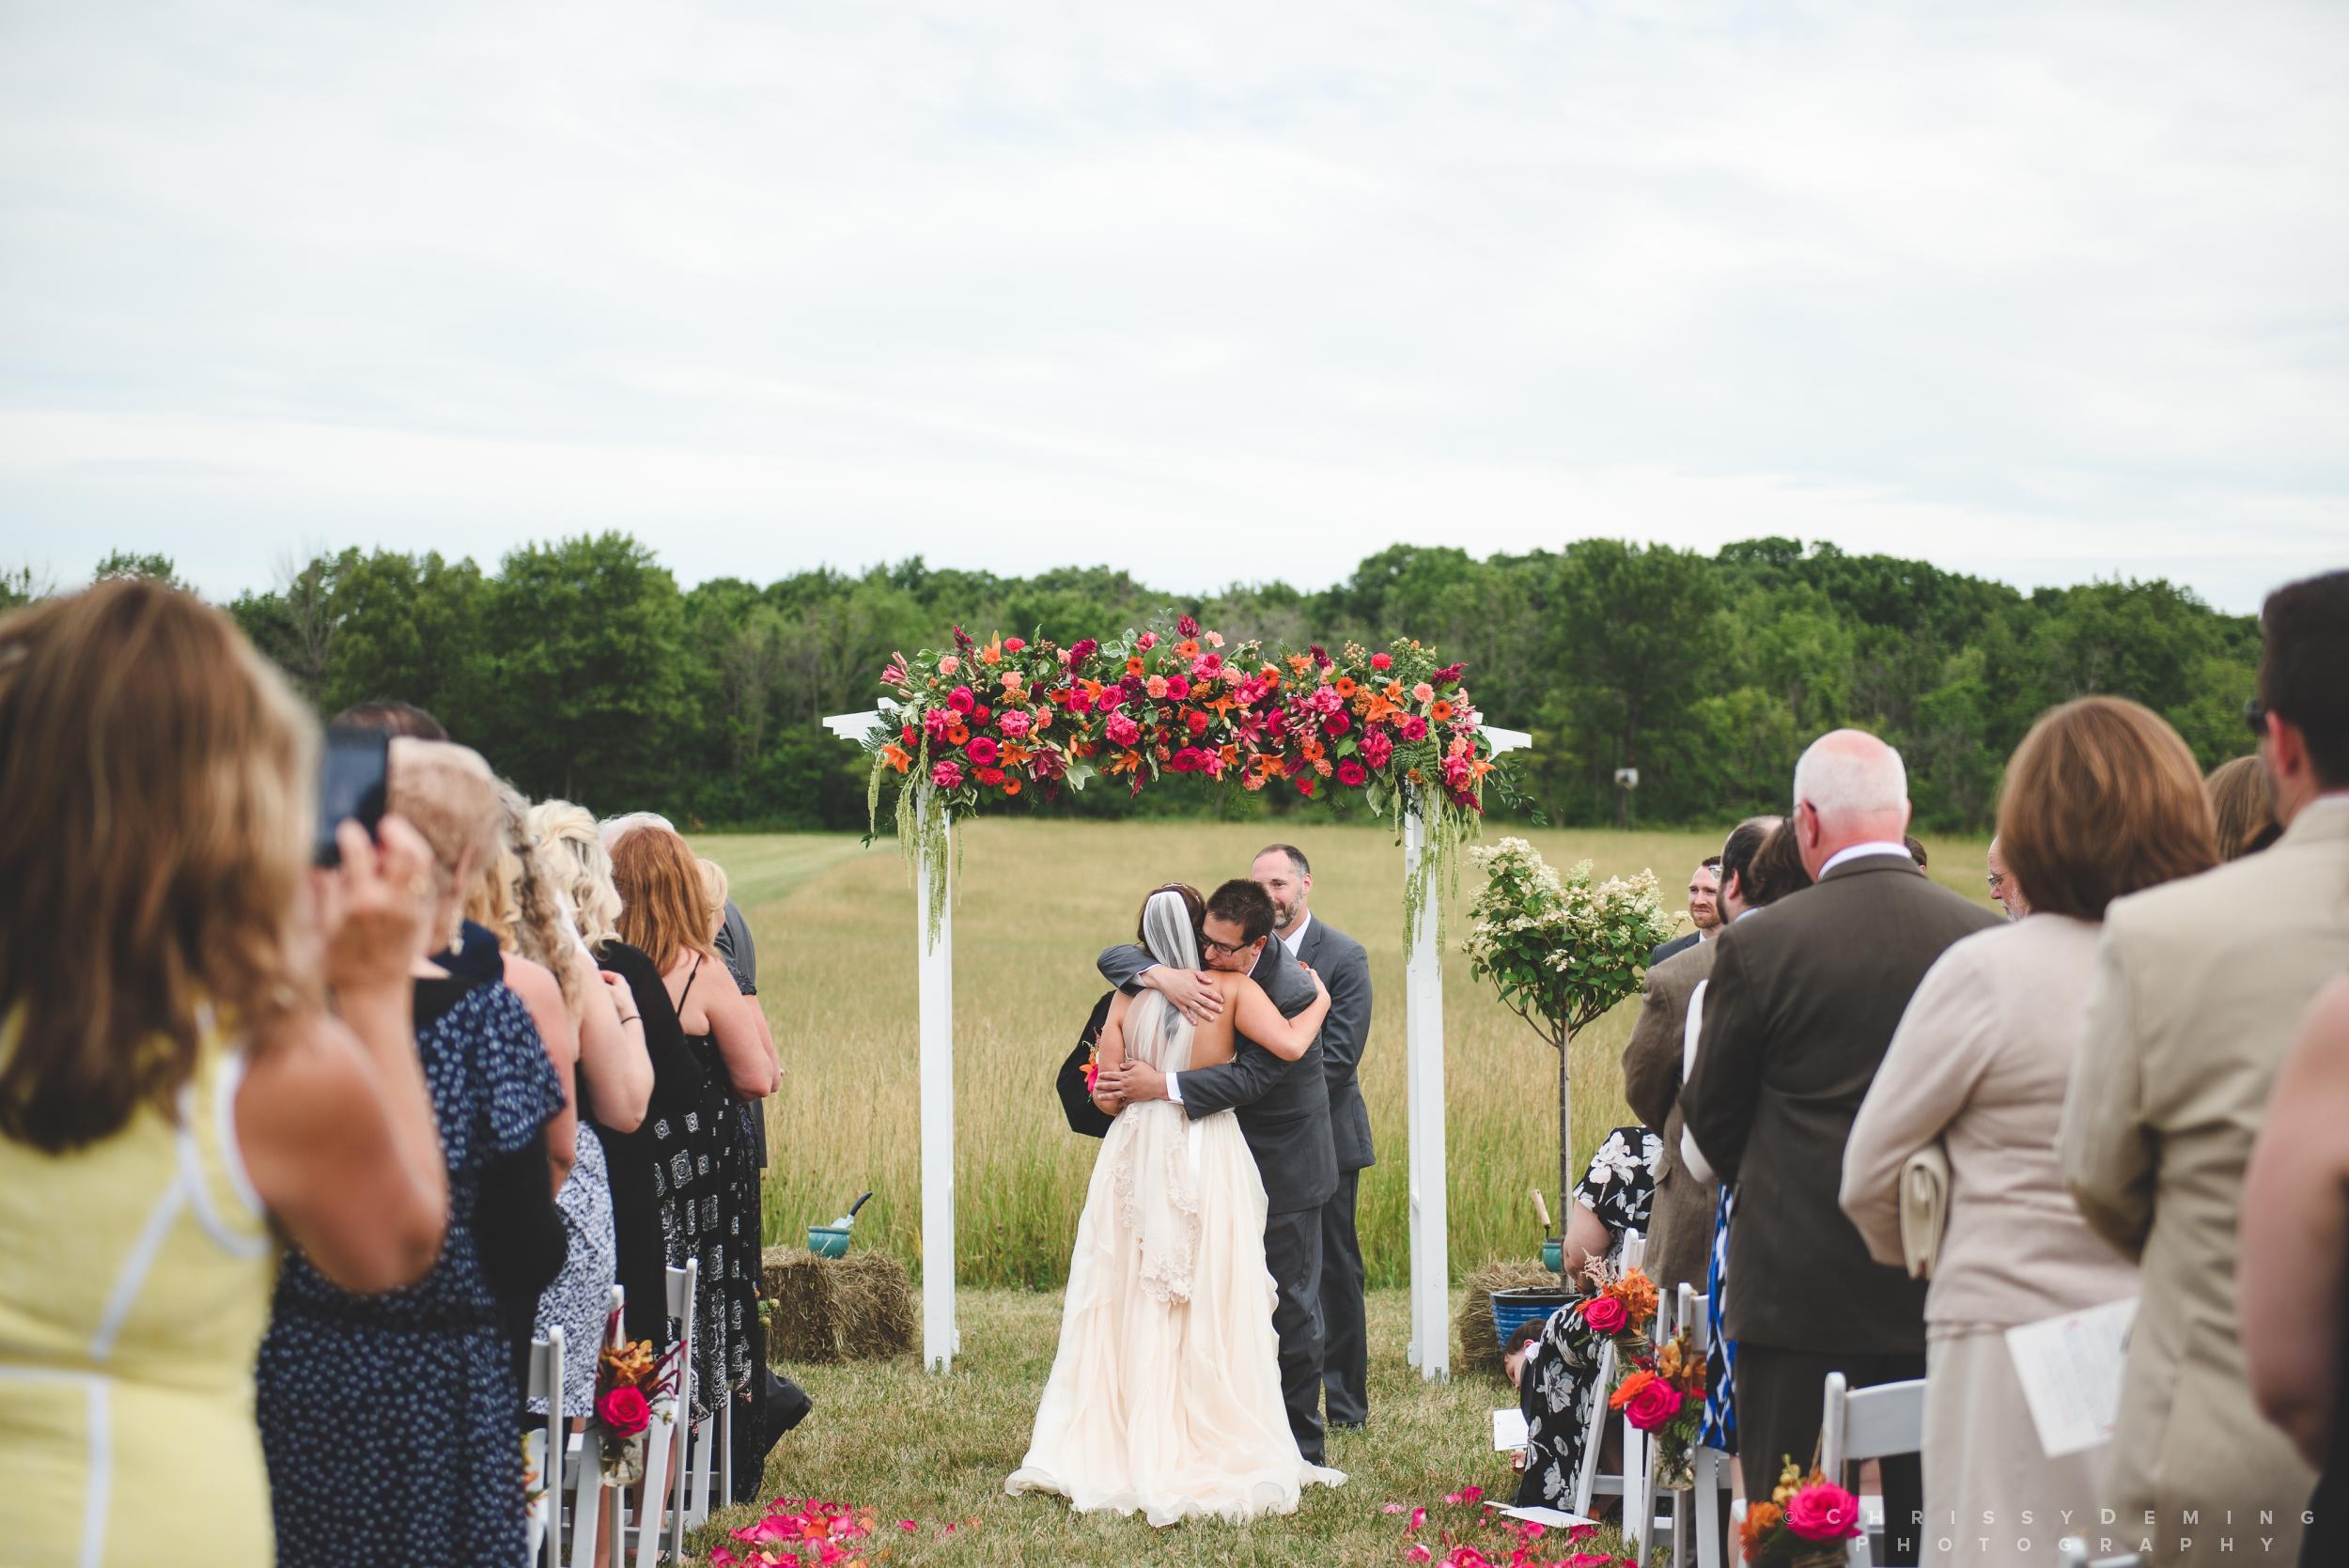 crete_IL_farm_wedding_photographer_0026.jpg